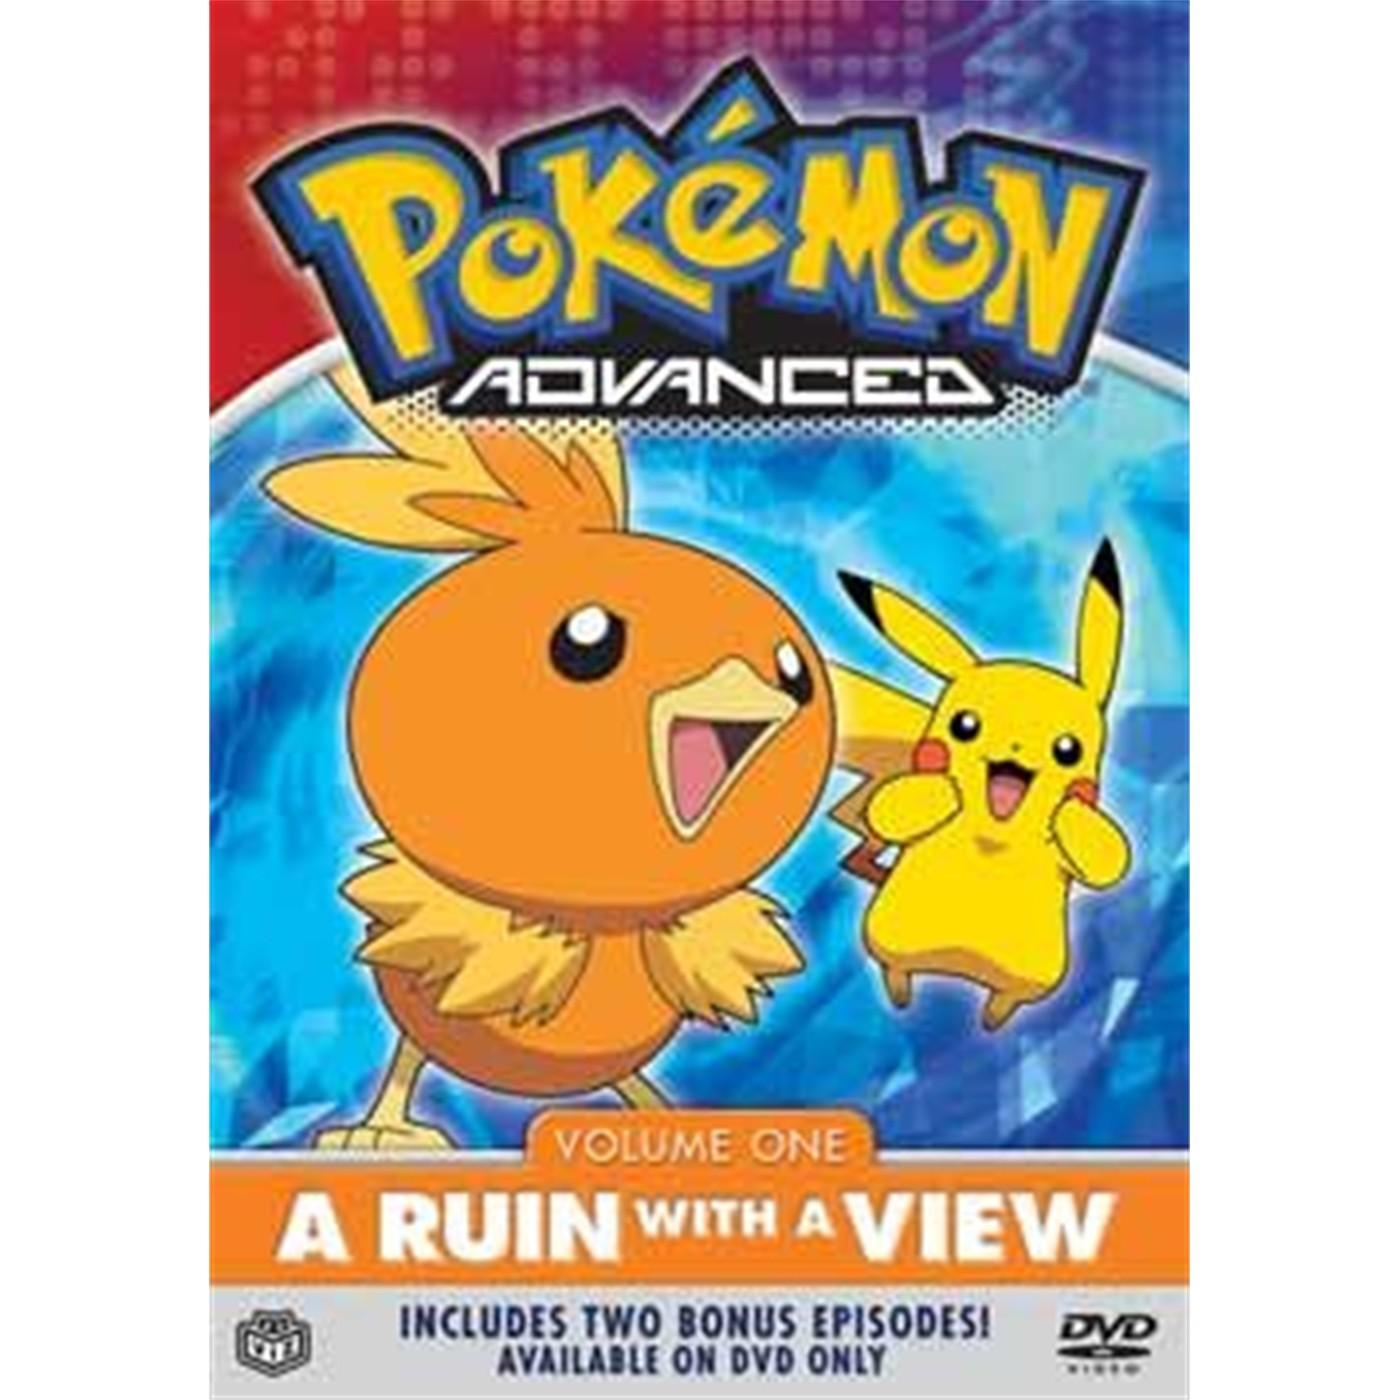 POKEMON ADVANCED (DVD), VOLUME 1